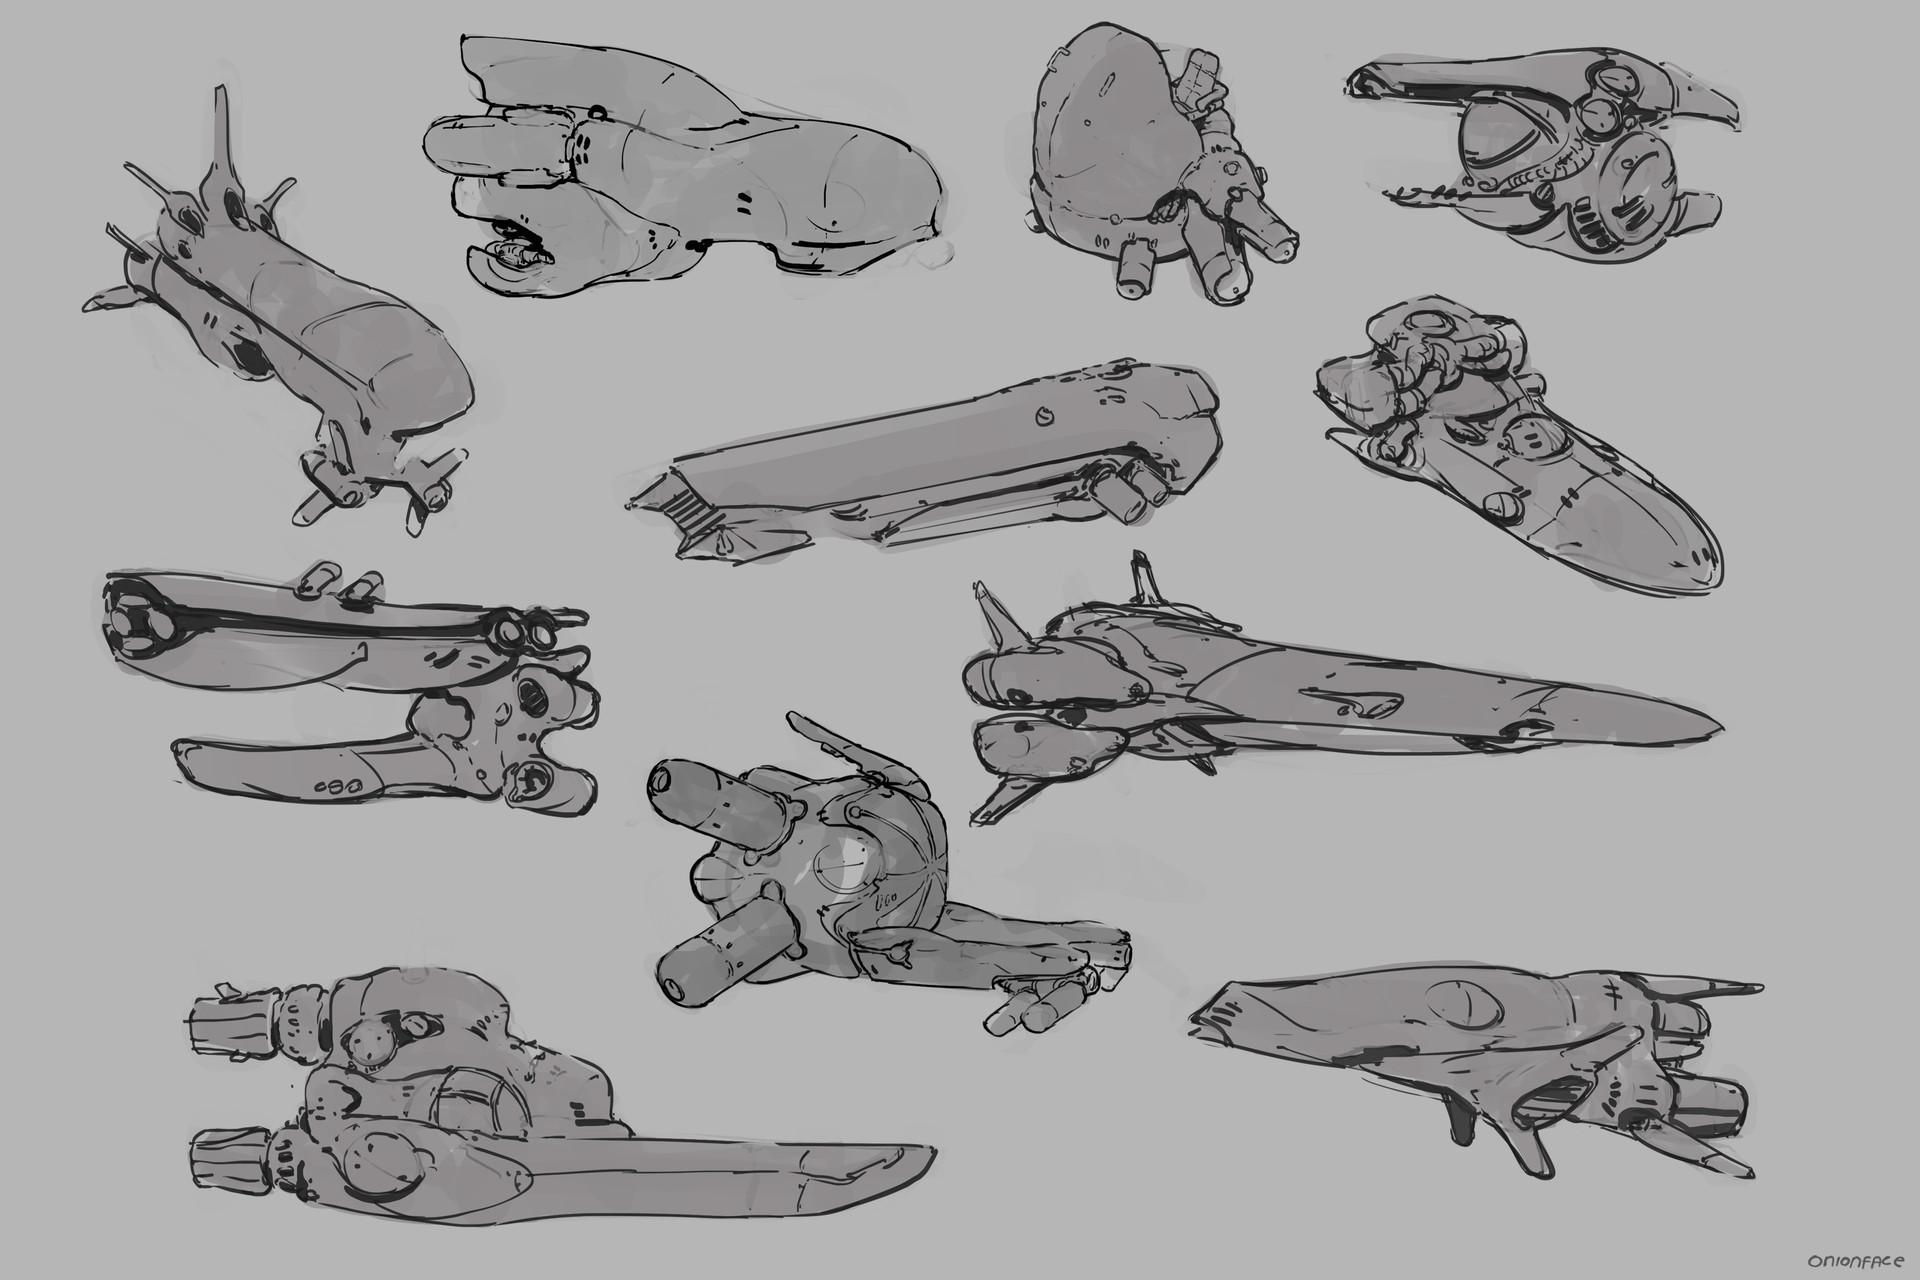 West clendinning spaceship doodles 02